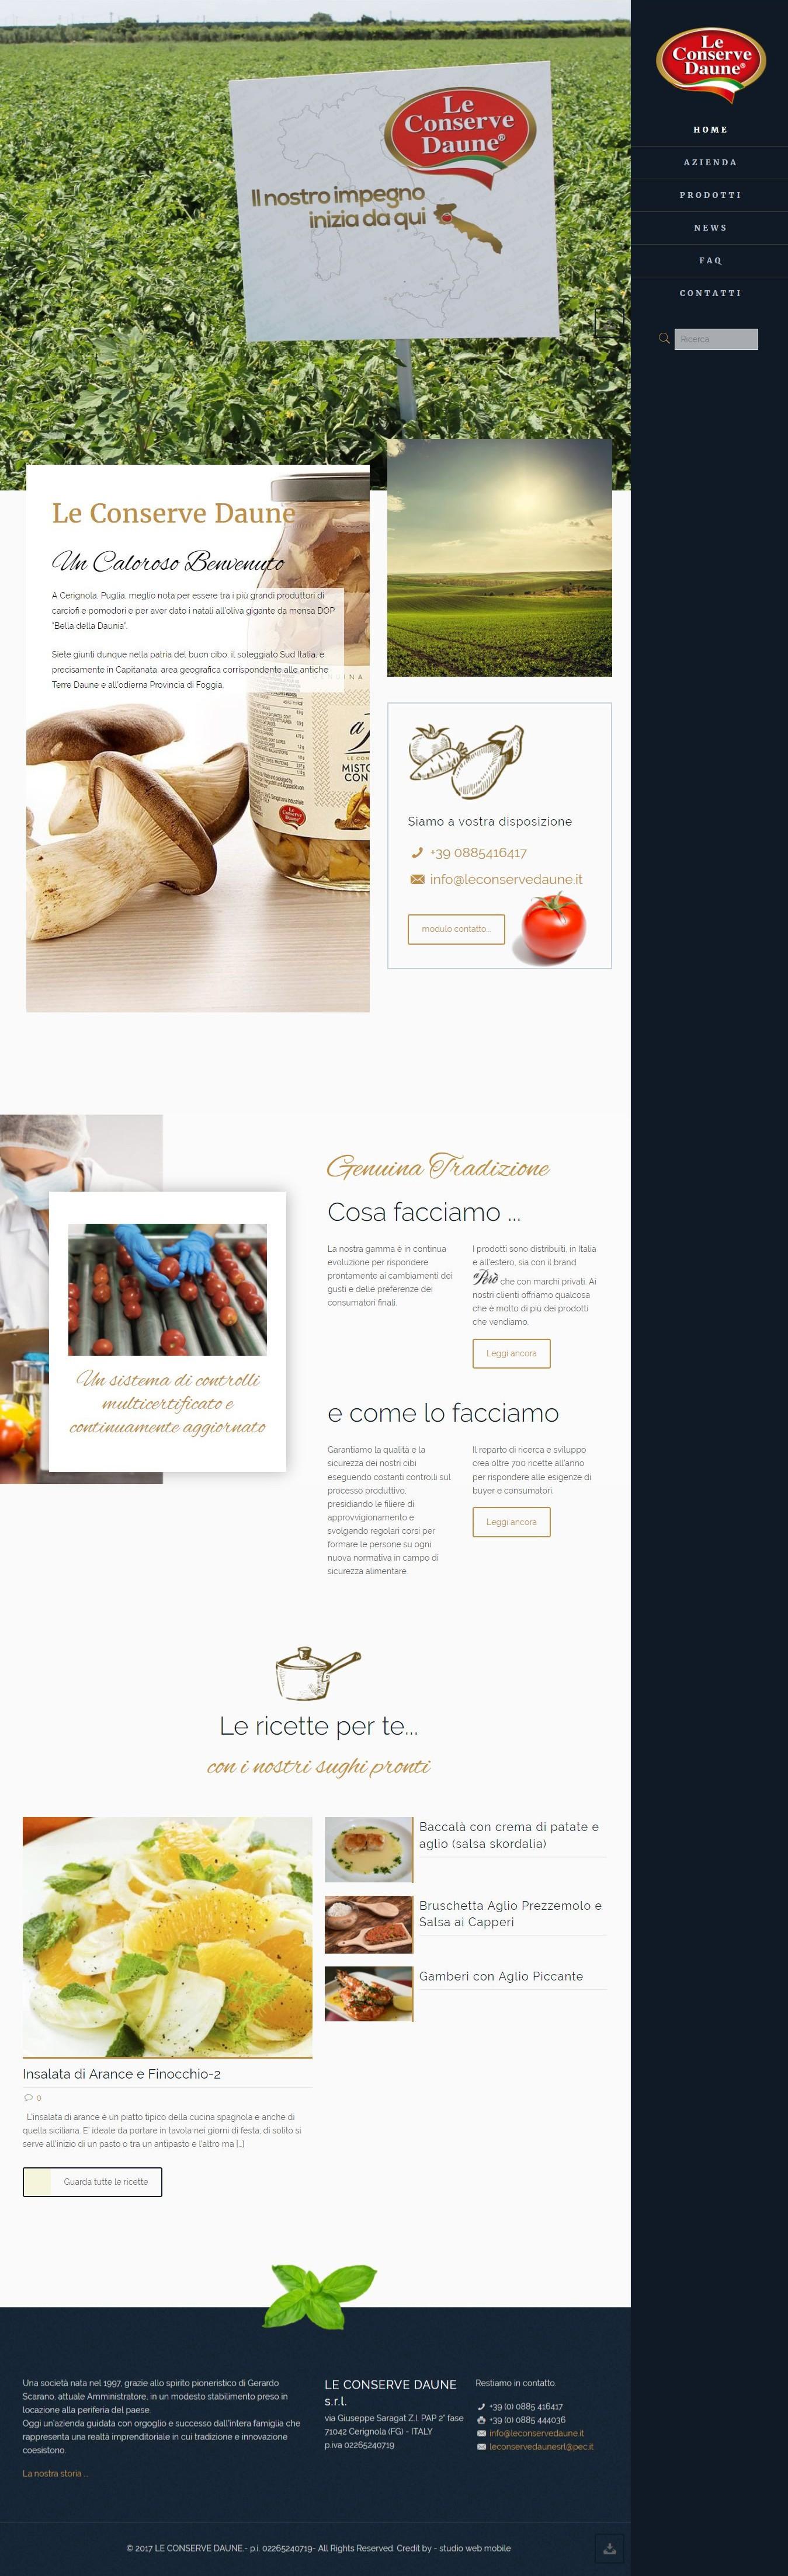 LE CONSERVE DAUNE-nuova_officina_web